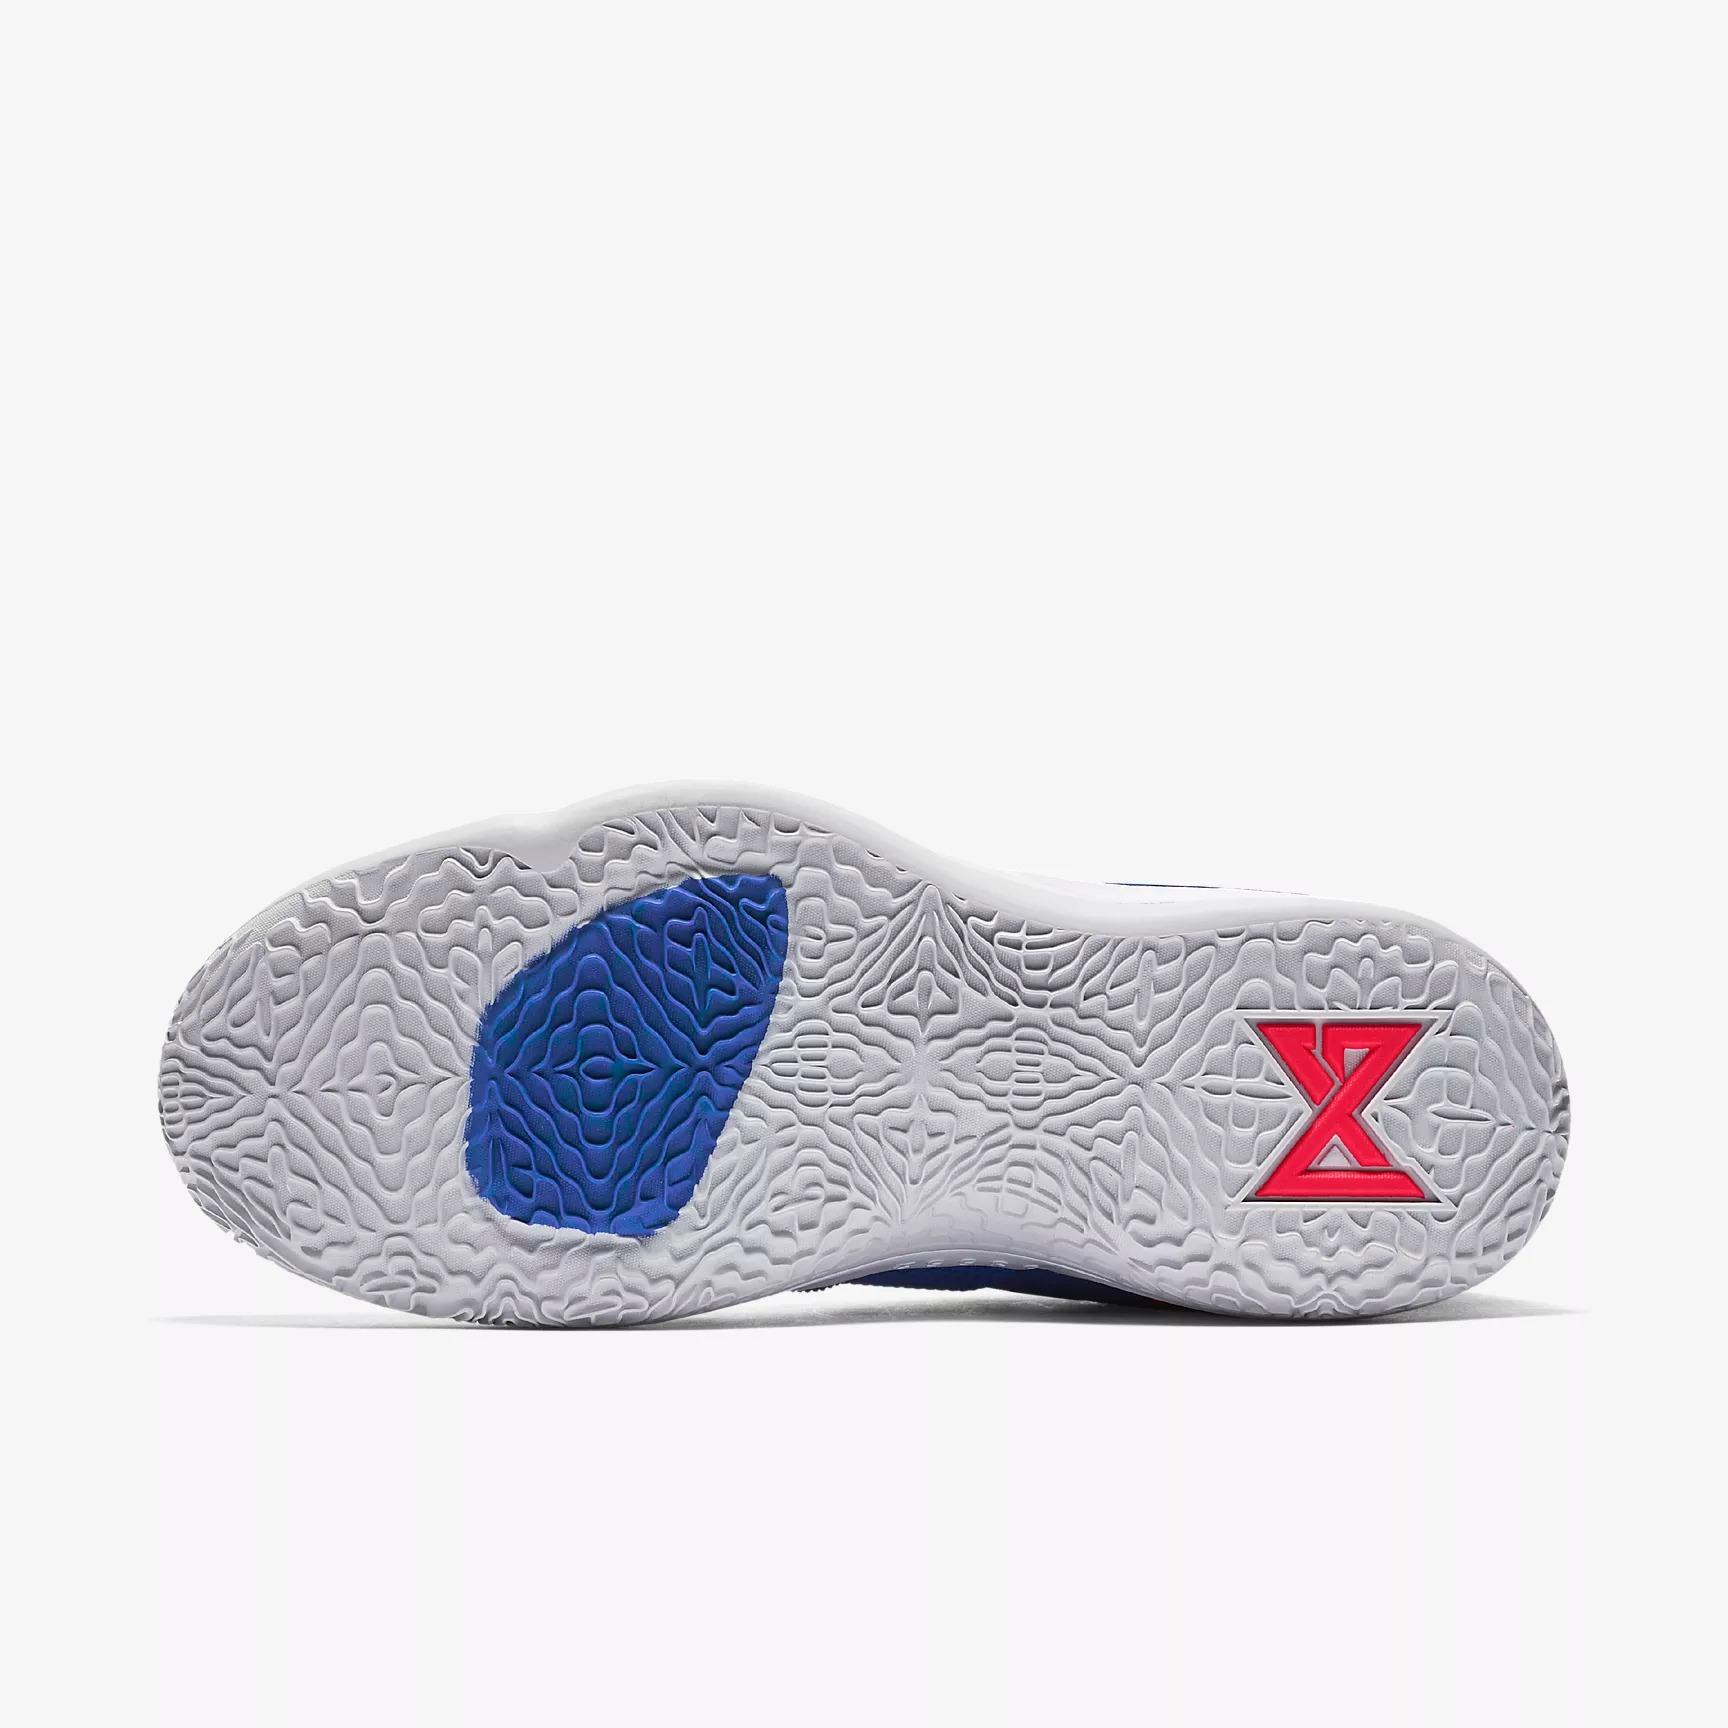 1ff724800c23c8 Nike PG 2.5 Fortnite Basketball Shoes - BASKETBALL SHOES NIKE ...